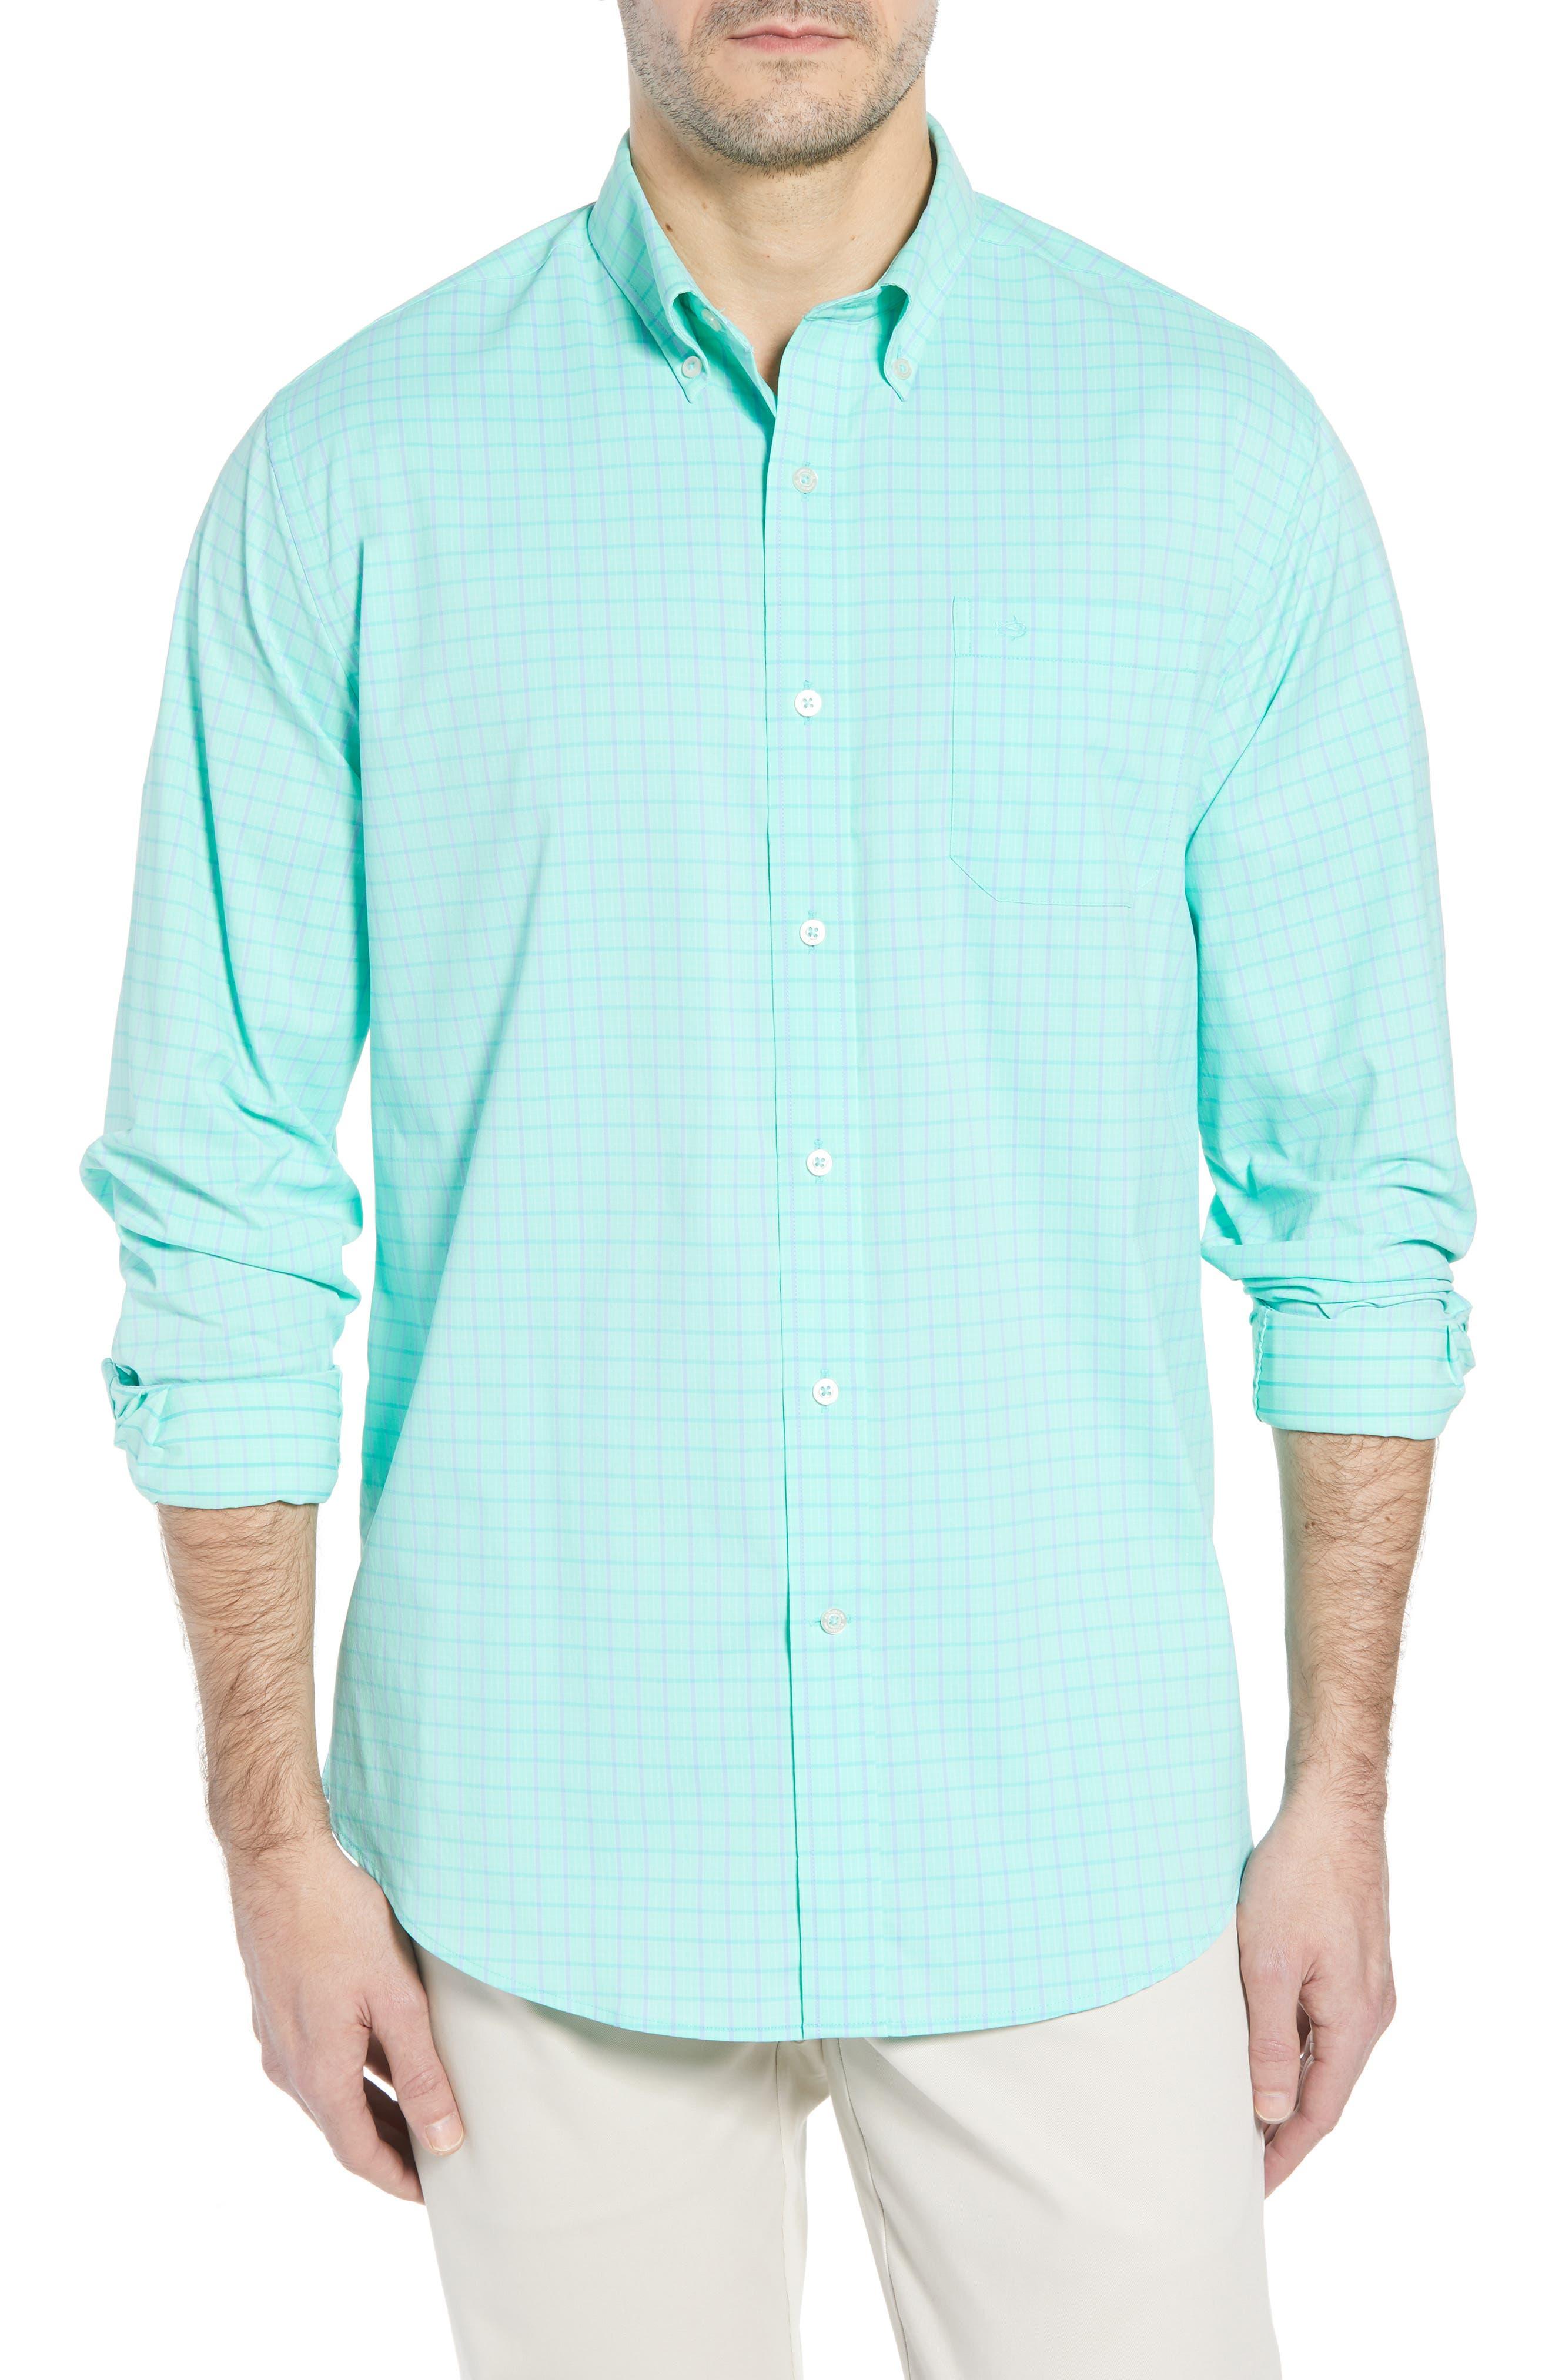 Intercoastal Gordia Plaid Sport Shirt,                         Main,                         color, Sea Foam